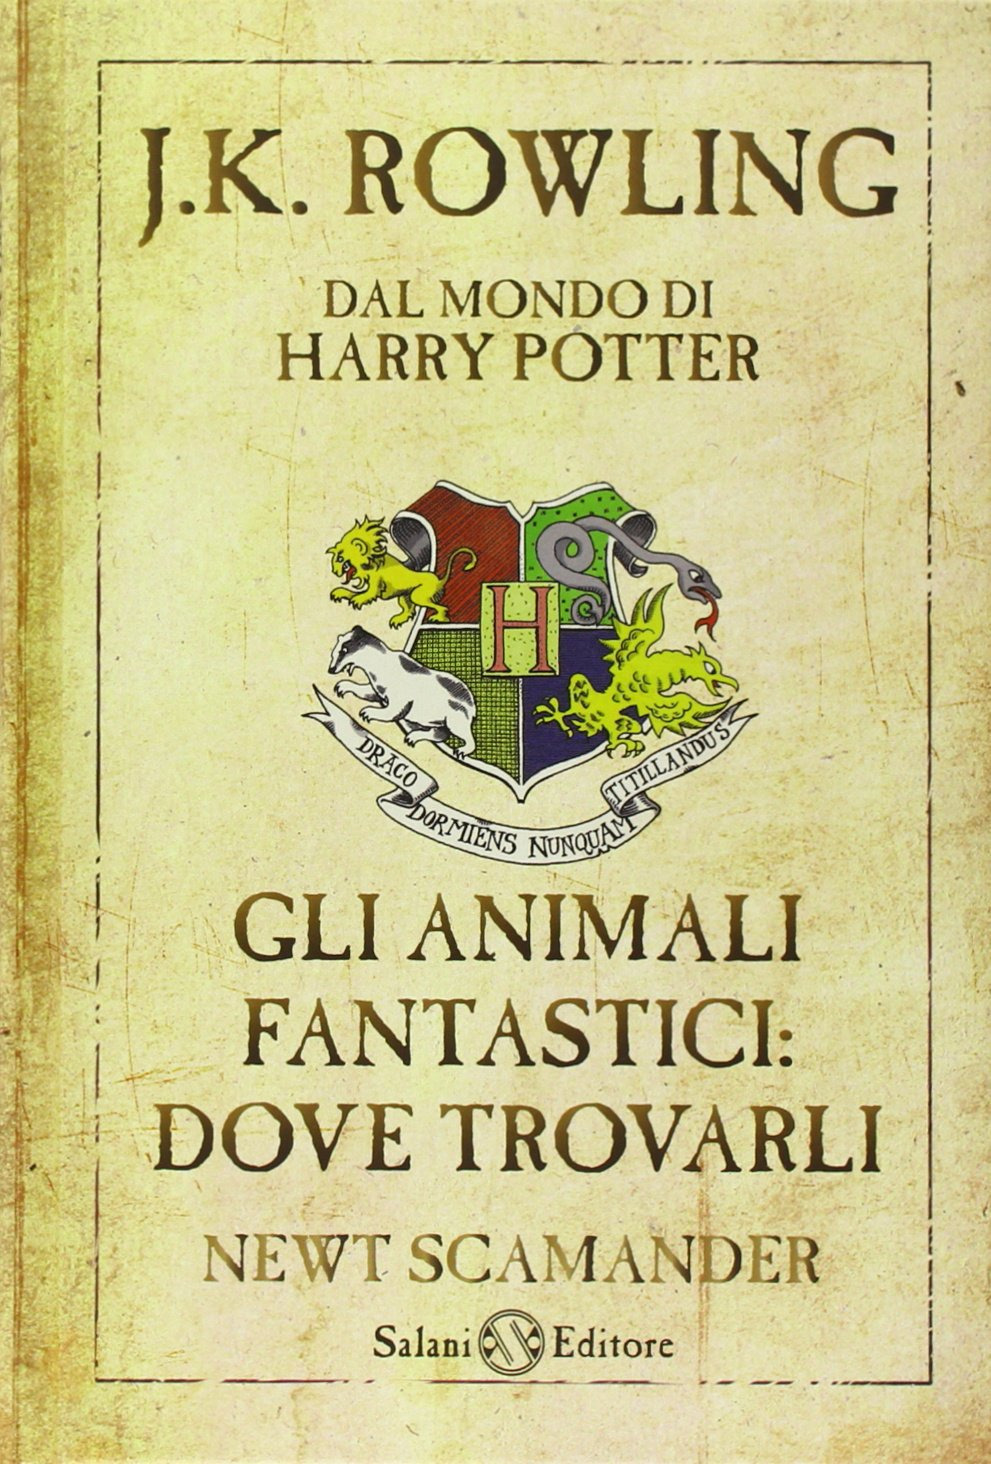 Gli Animali Fantastici: dove trovarli - Rowling, J.K ...